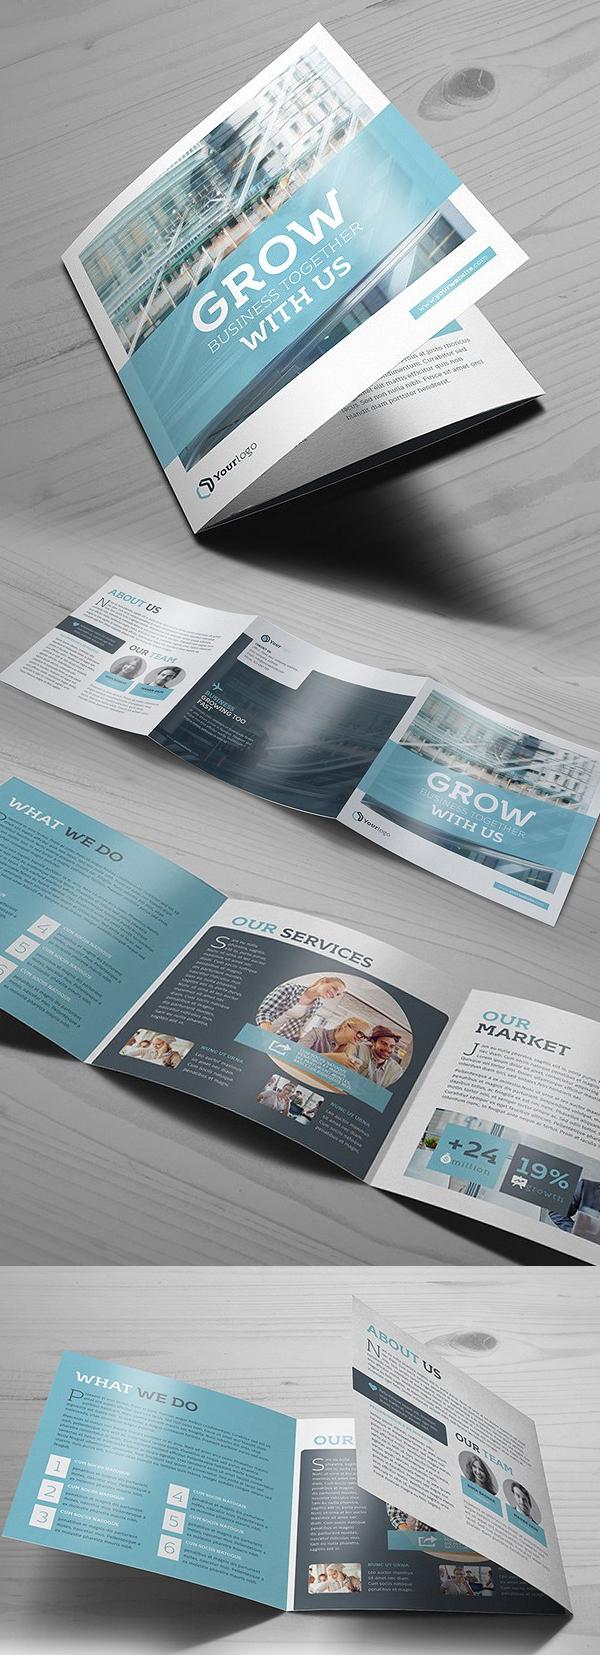 100 Professional Corporate Brochure Templates - 28